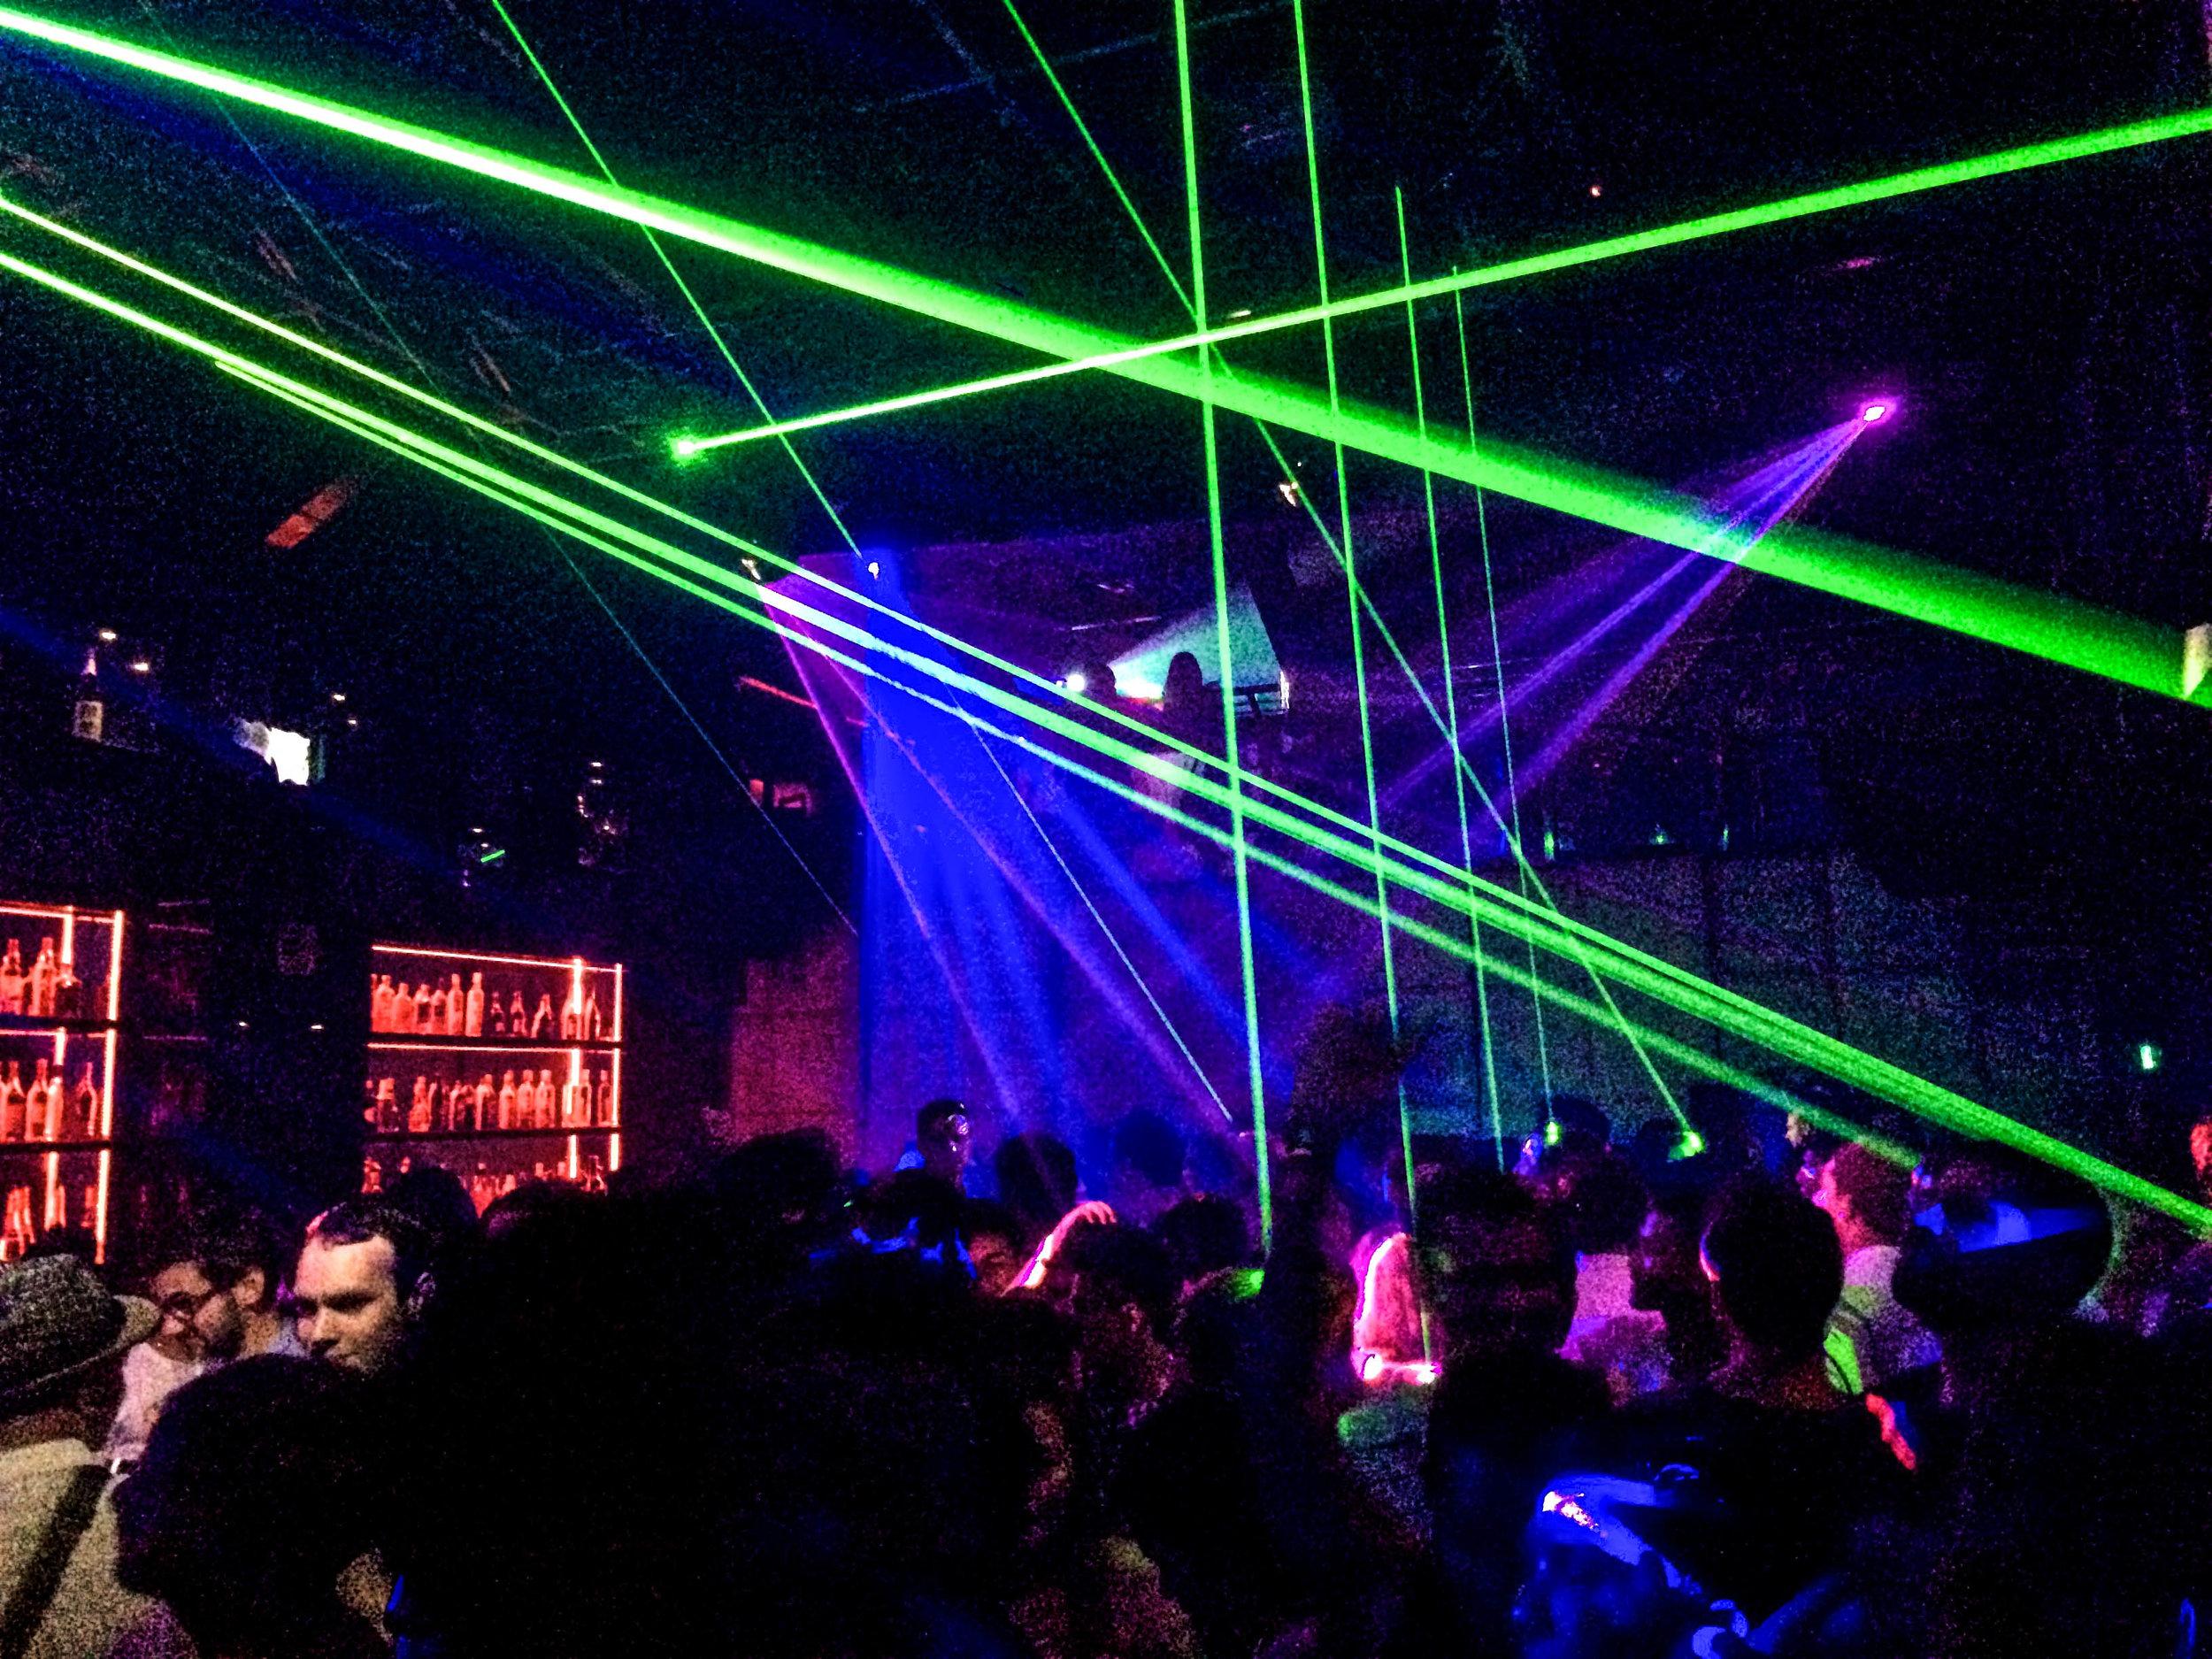 J-1 Bar nightlife rangoon yangon burma myanmar 2-2.jpg